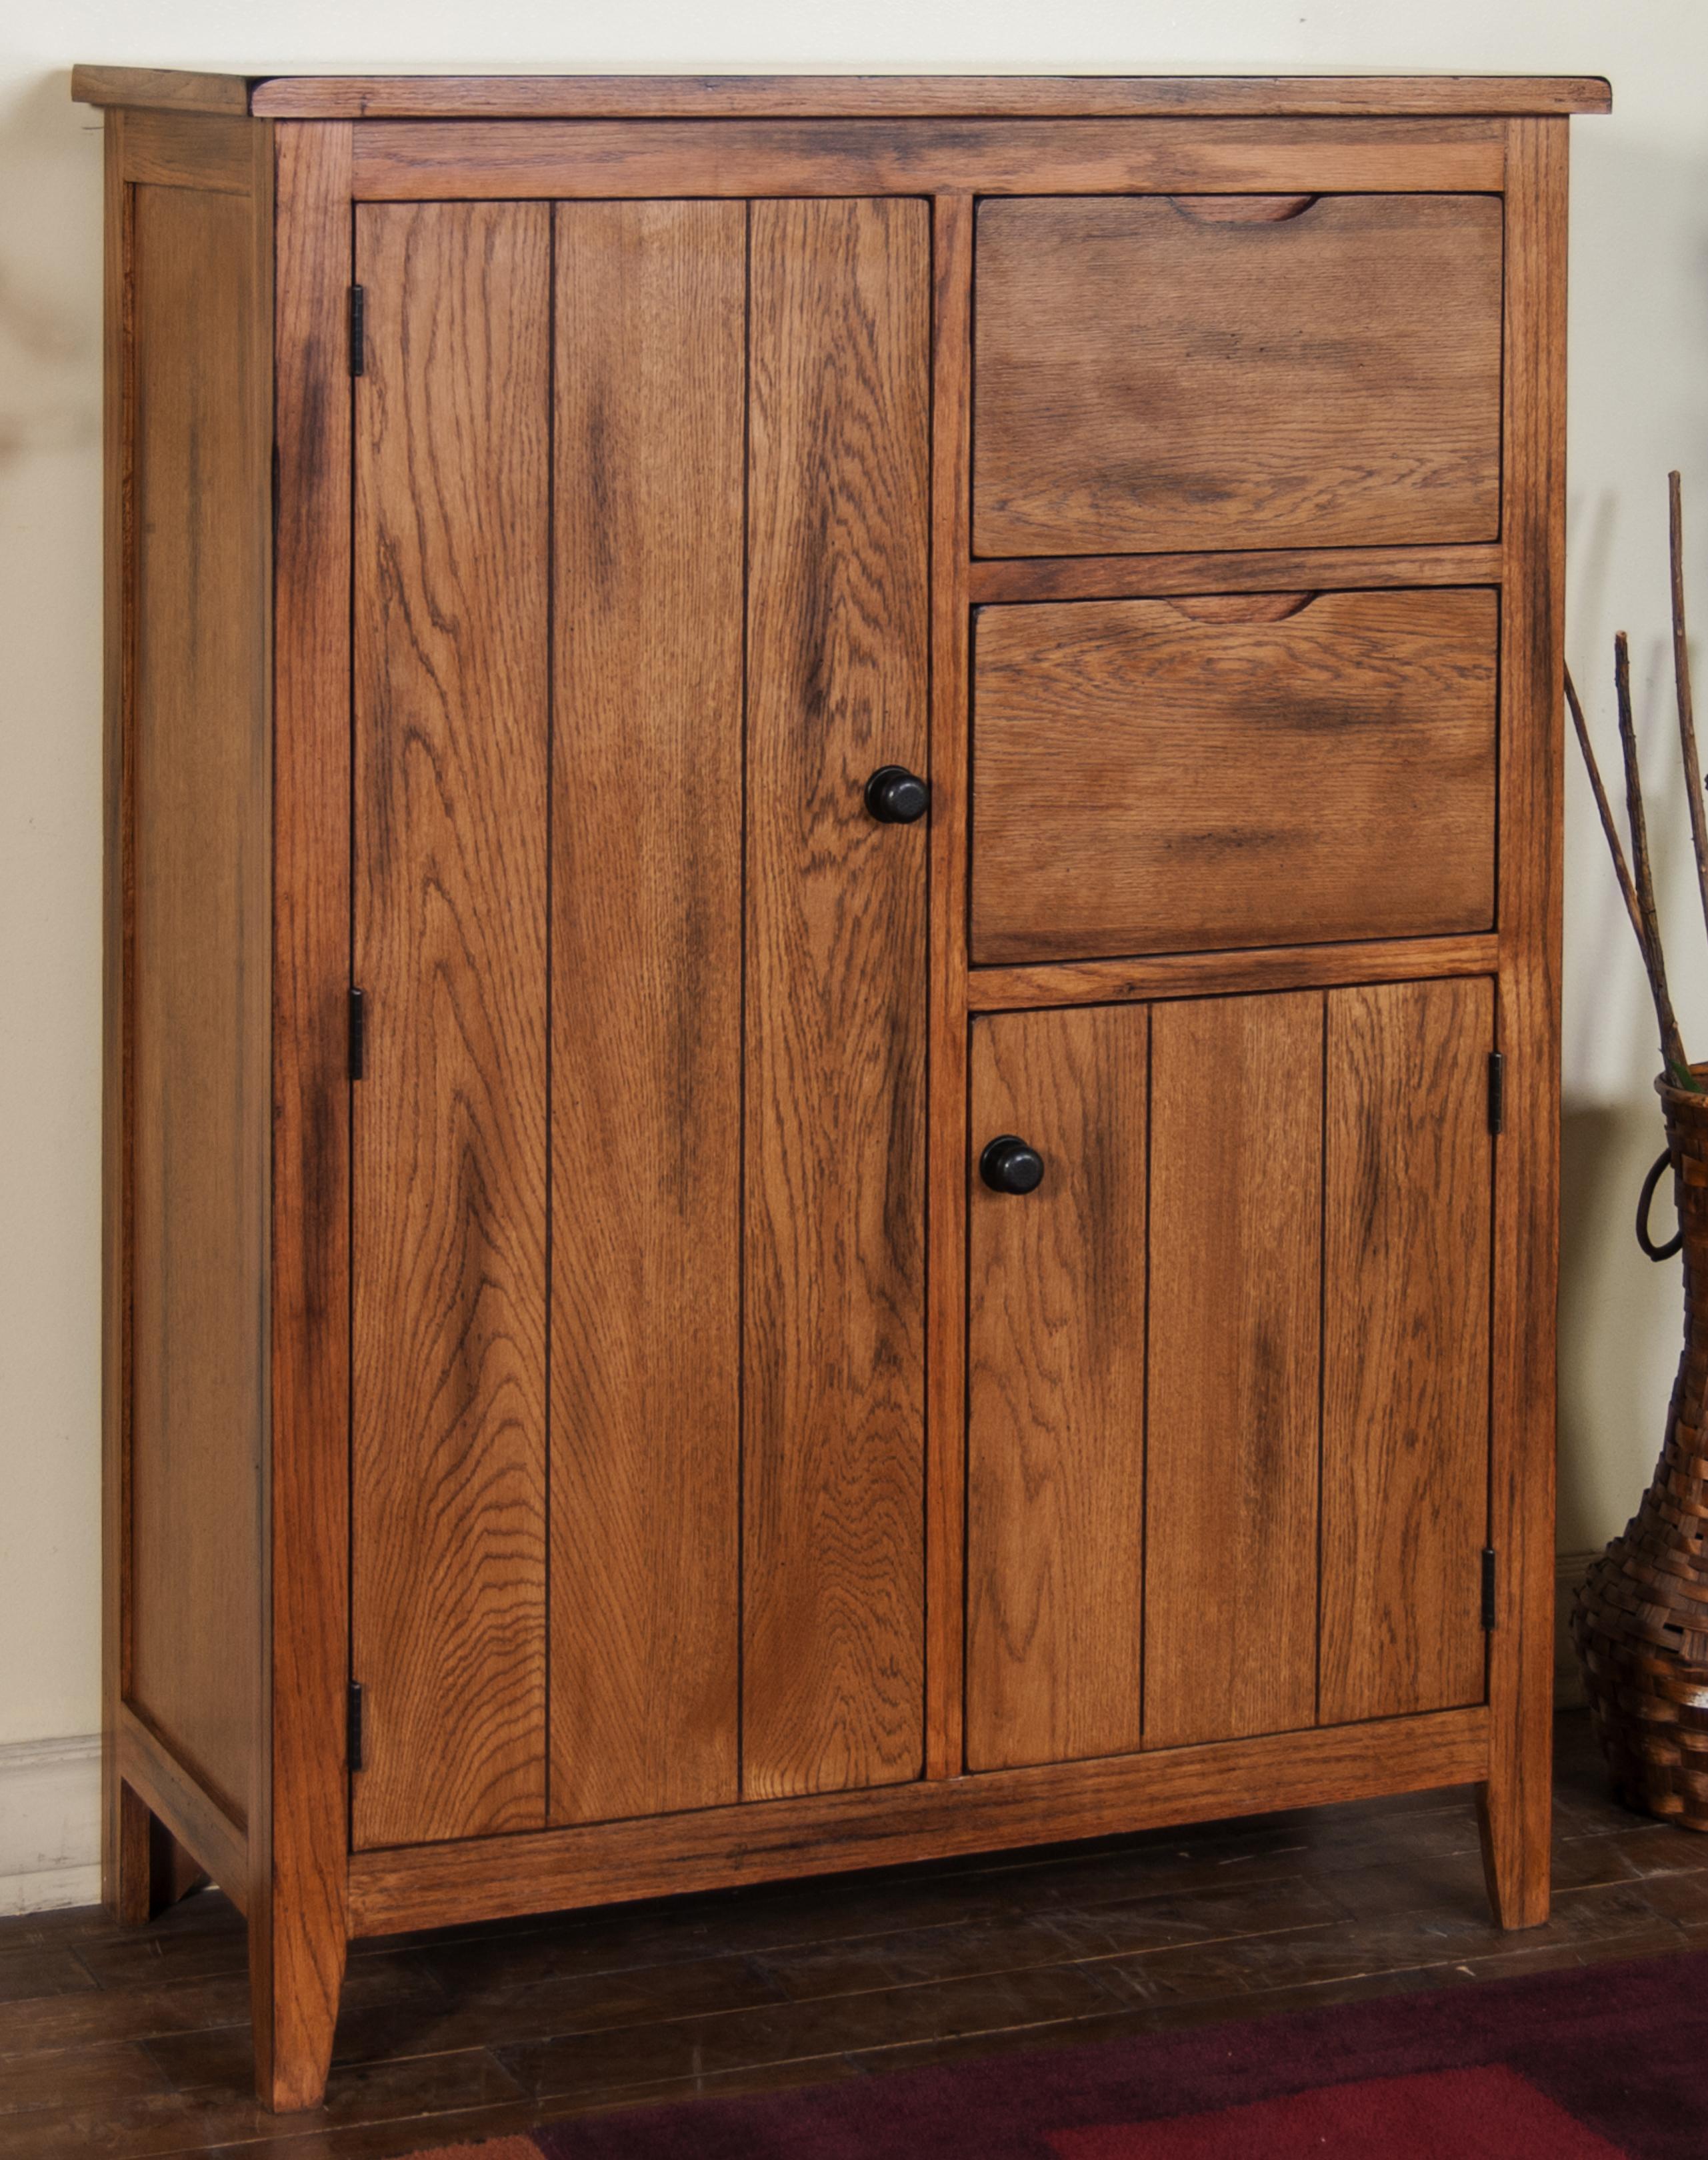 Morris Home Furnishings From Morris Home Furnishings - Tuscola Cupboard - Item Number: 2230RO